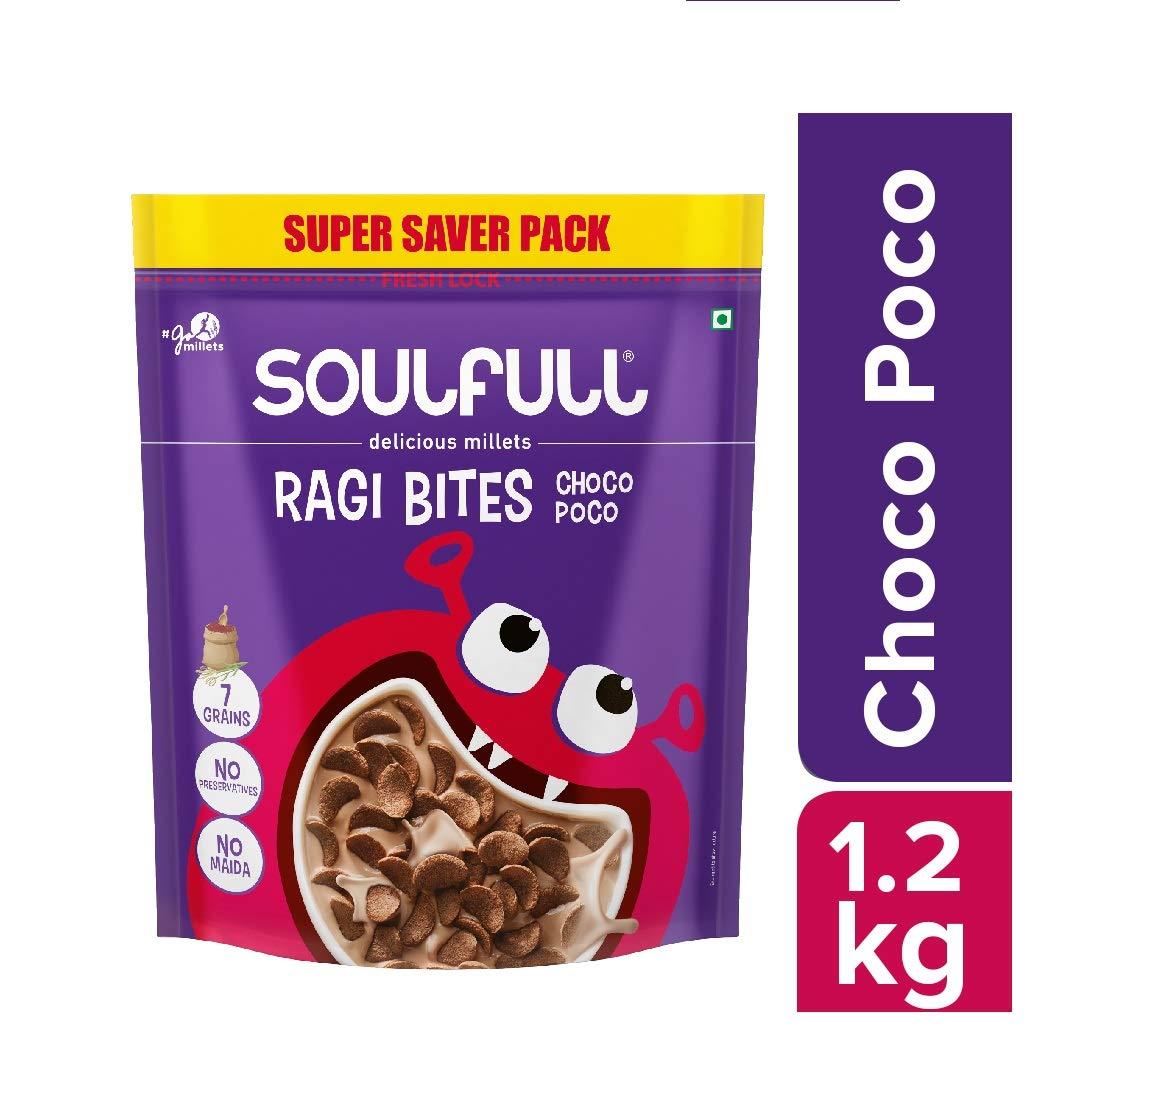 Soulfull Ragi Bites- Choco Poco, 1.2kg- No Maida